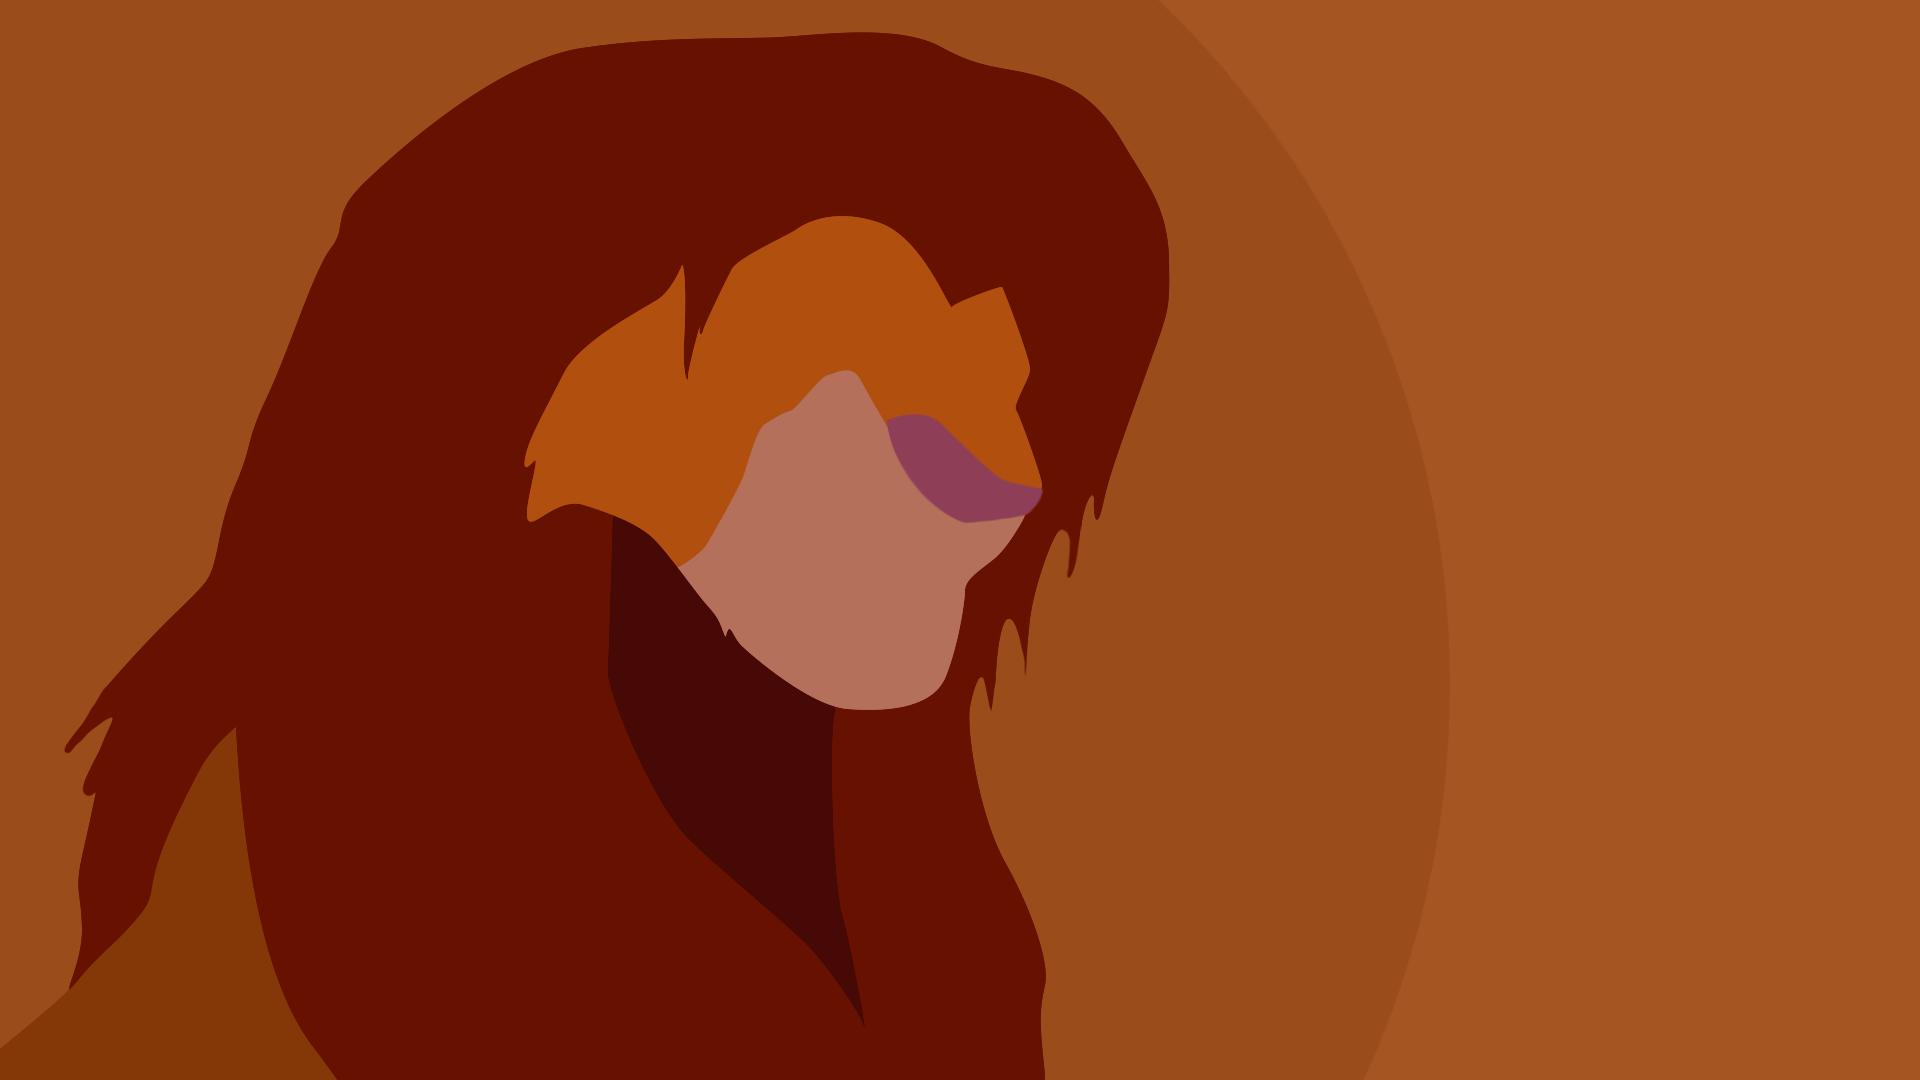 Lion King Simba Wallpaper 86313 Usbdata